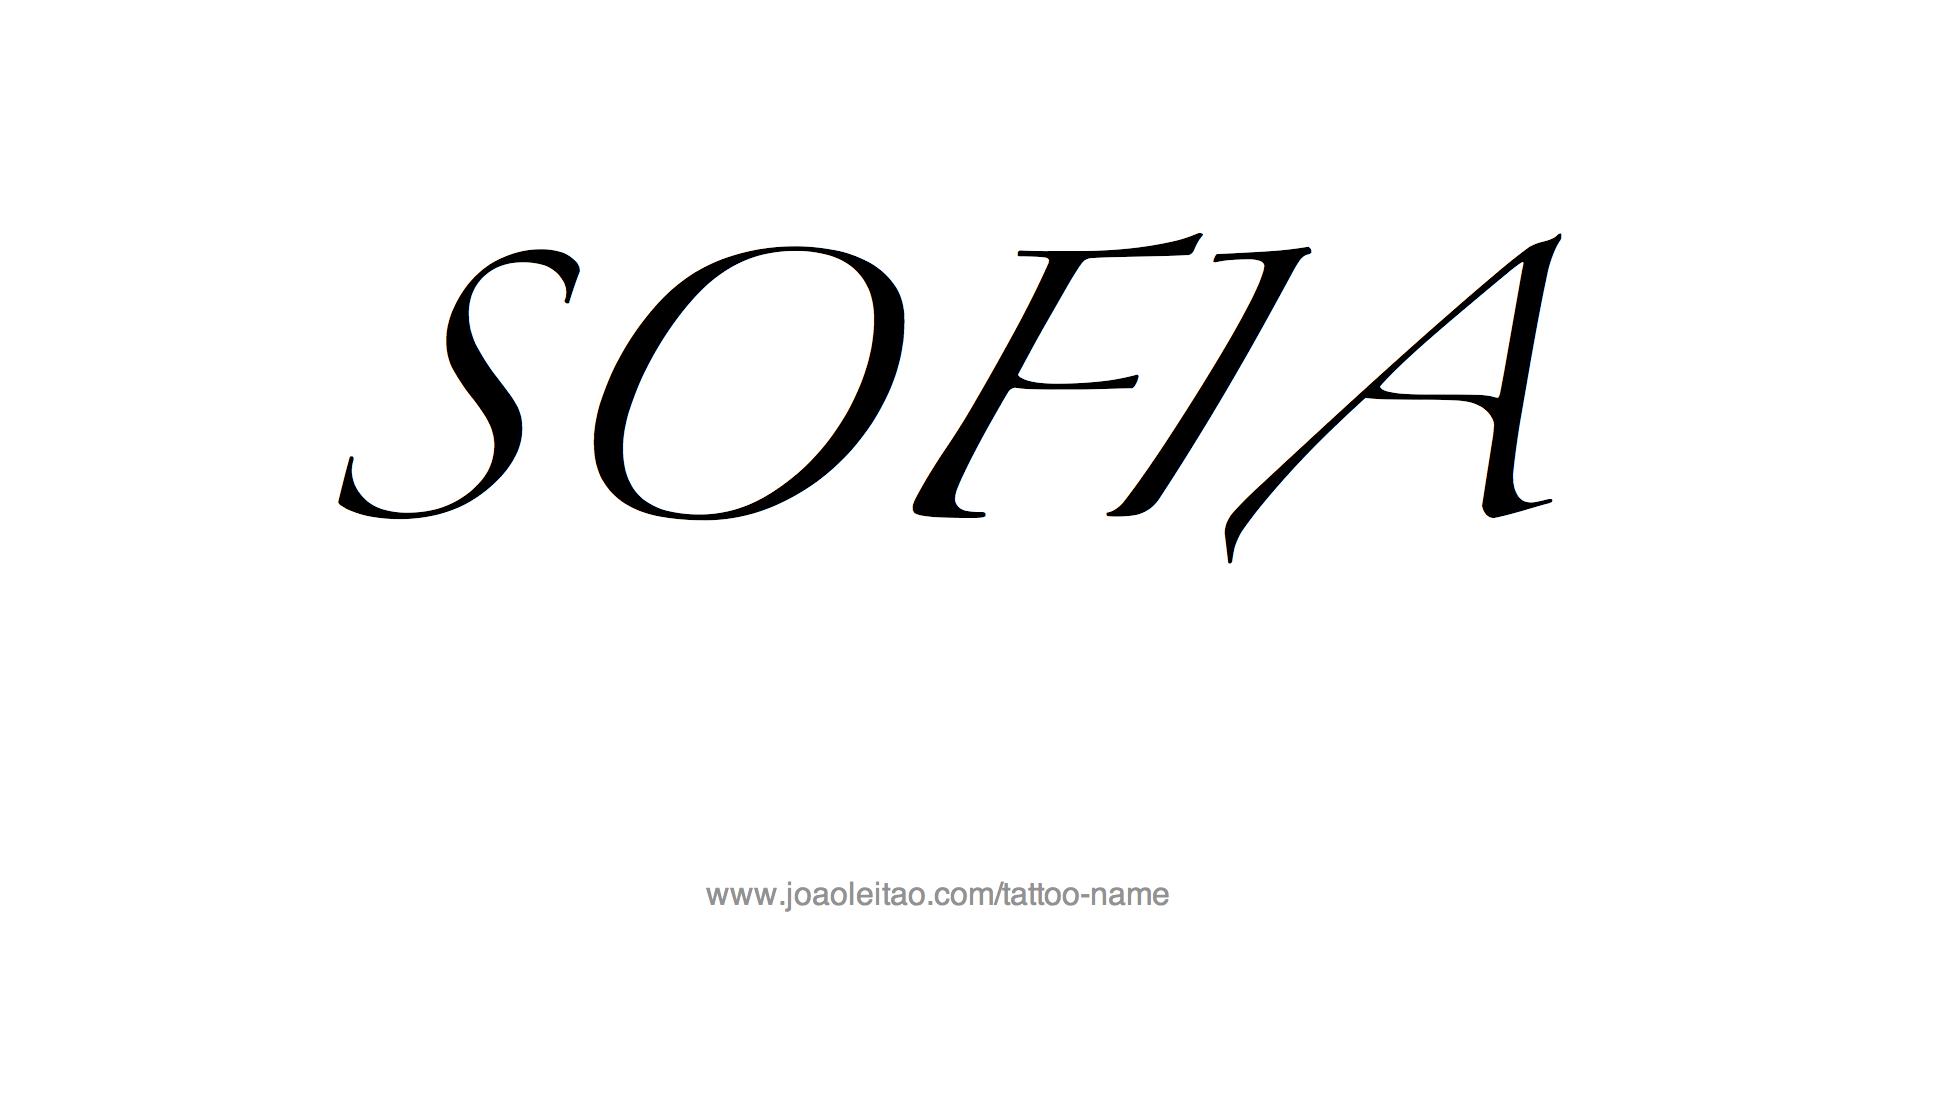 Sofia Name Tattoo Designs : tattoo design female name sofia2014 from www.joaoleitao.com size 1956 x 1098 png 79kB